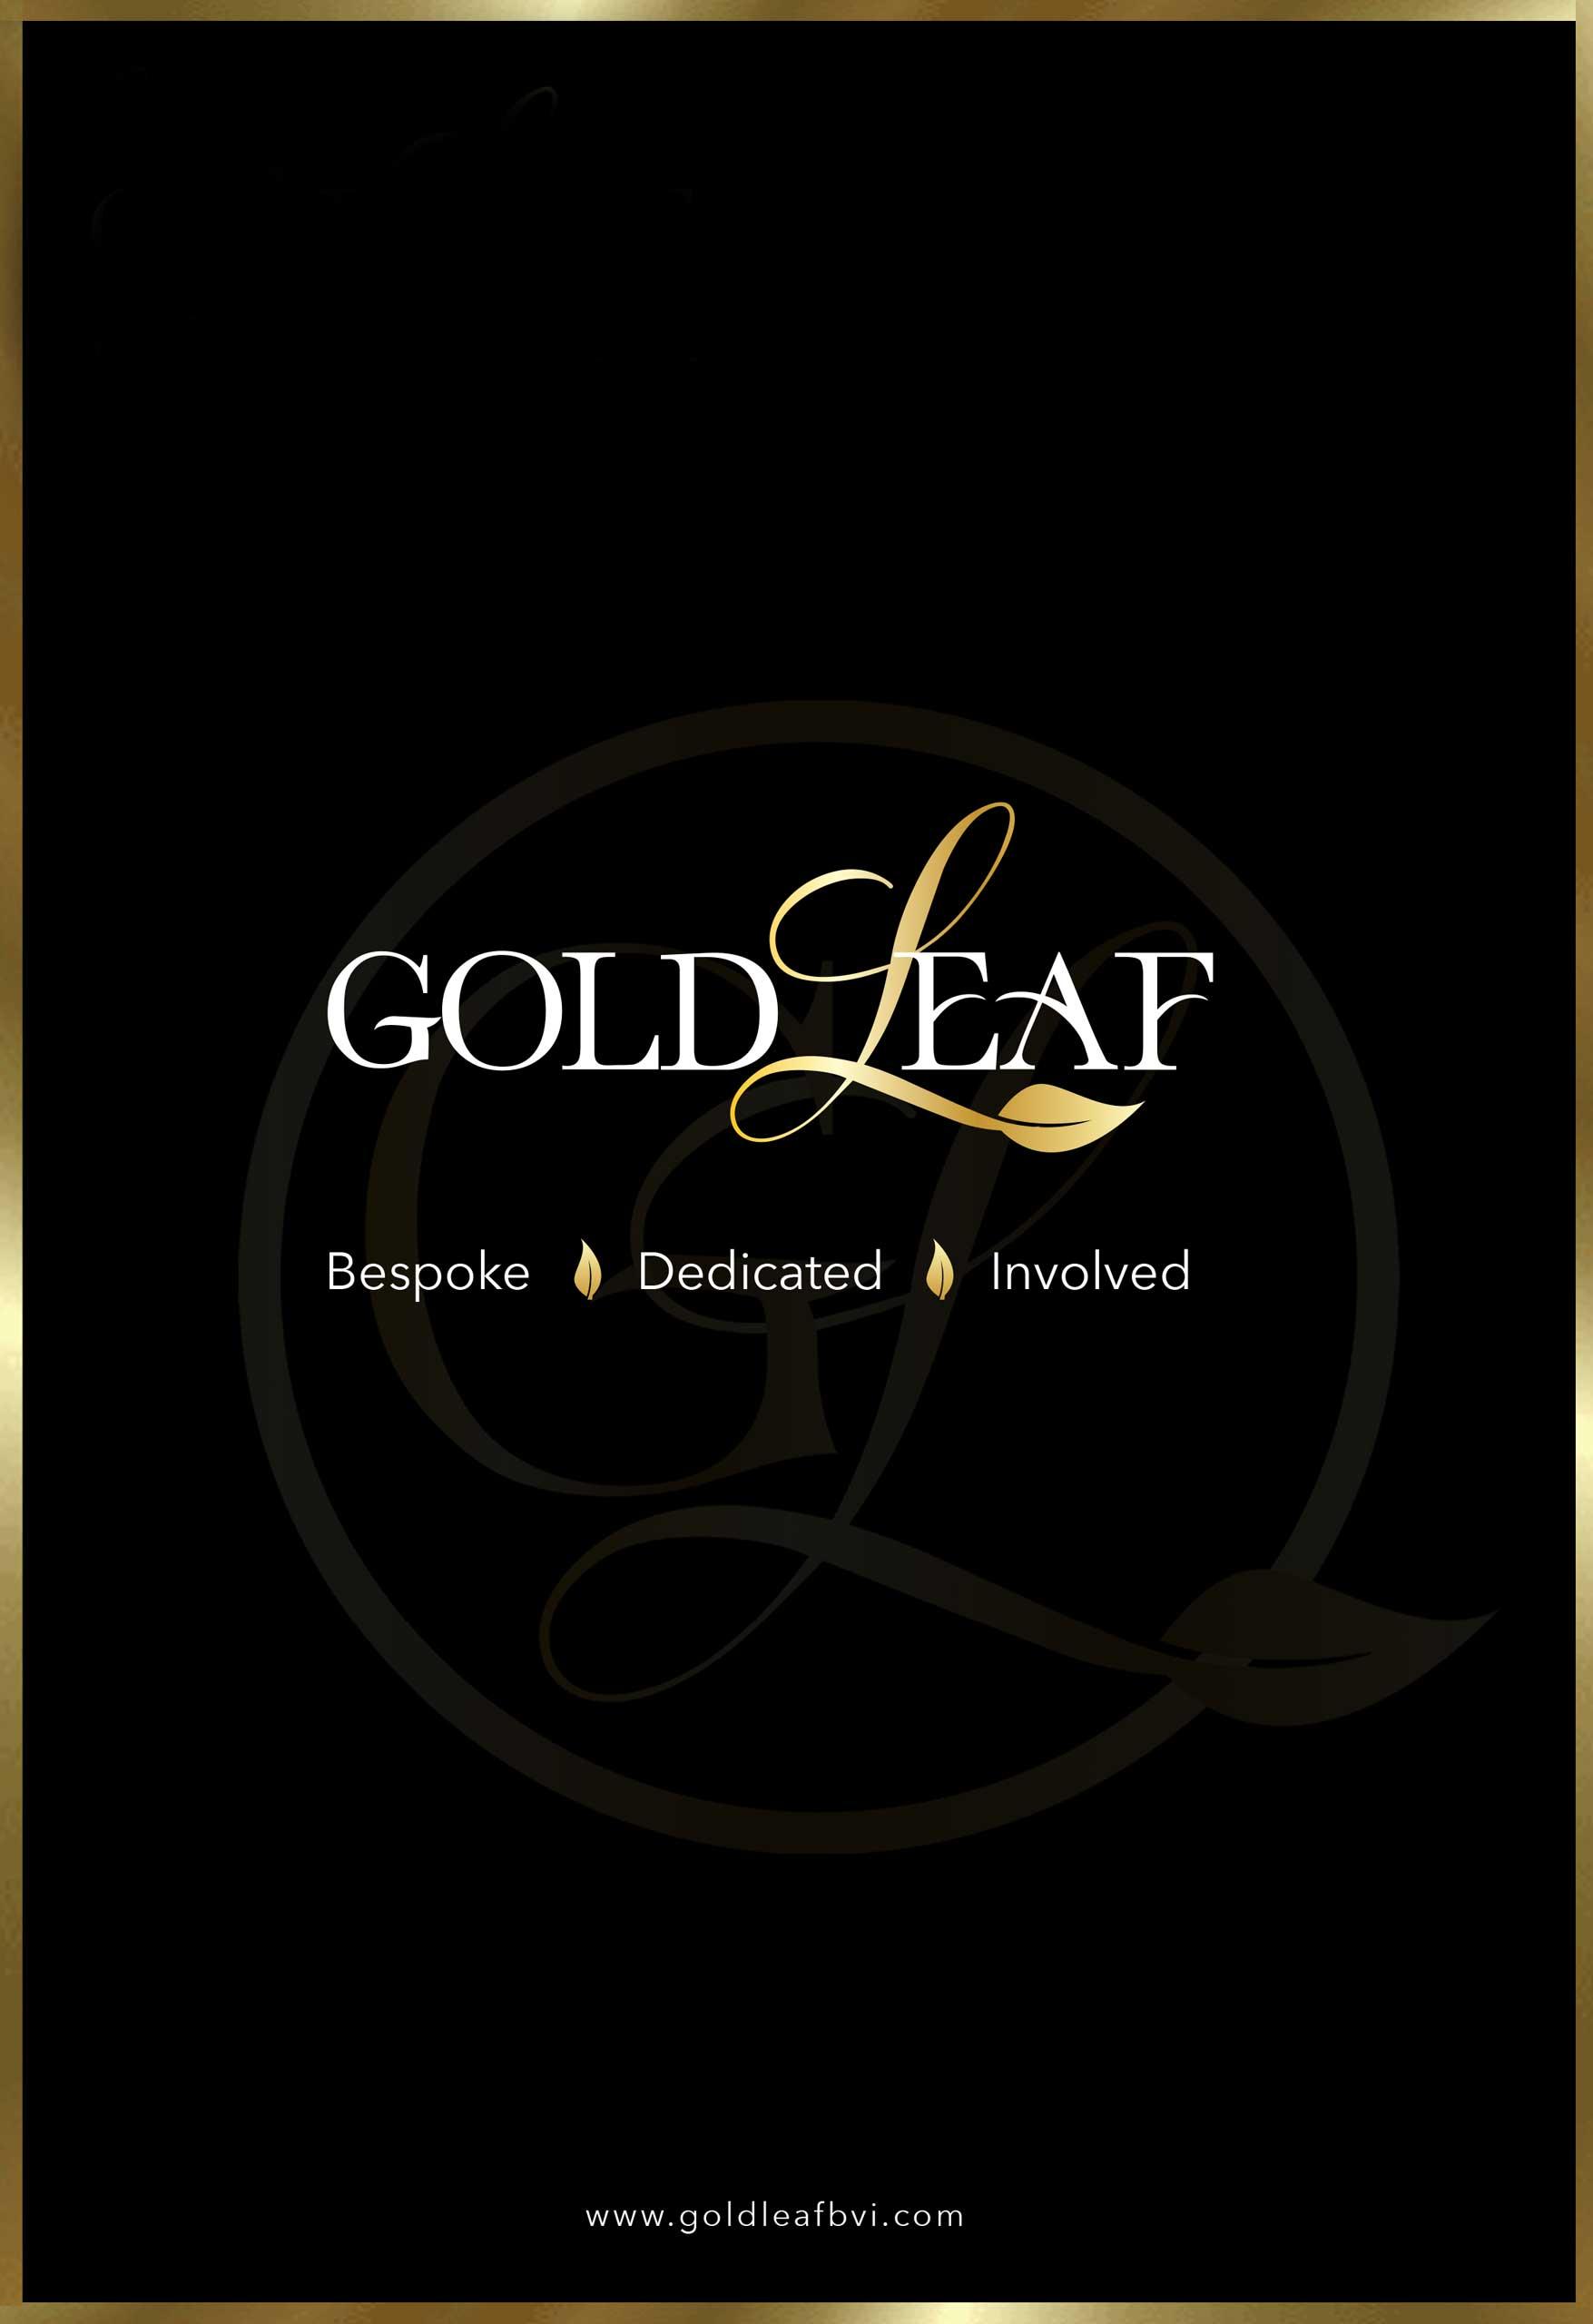 Gold-Leaf-SOLUTIONS-Menu-6